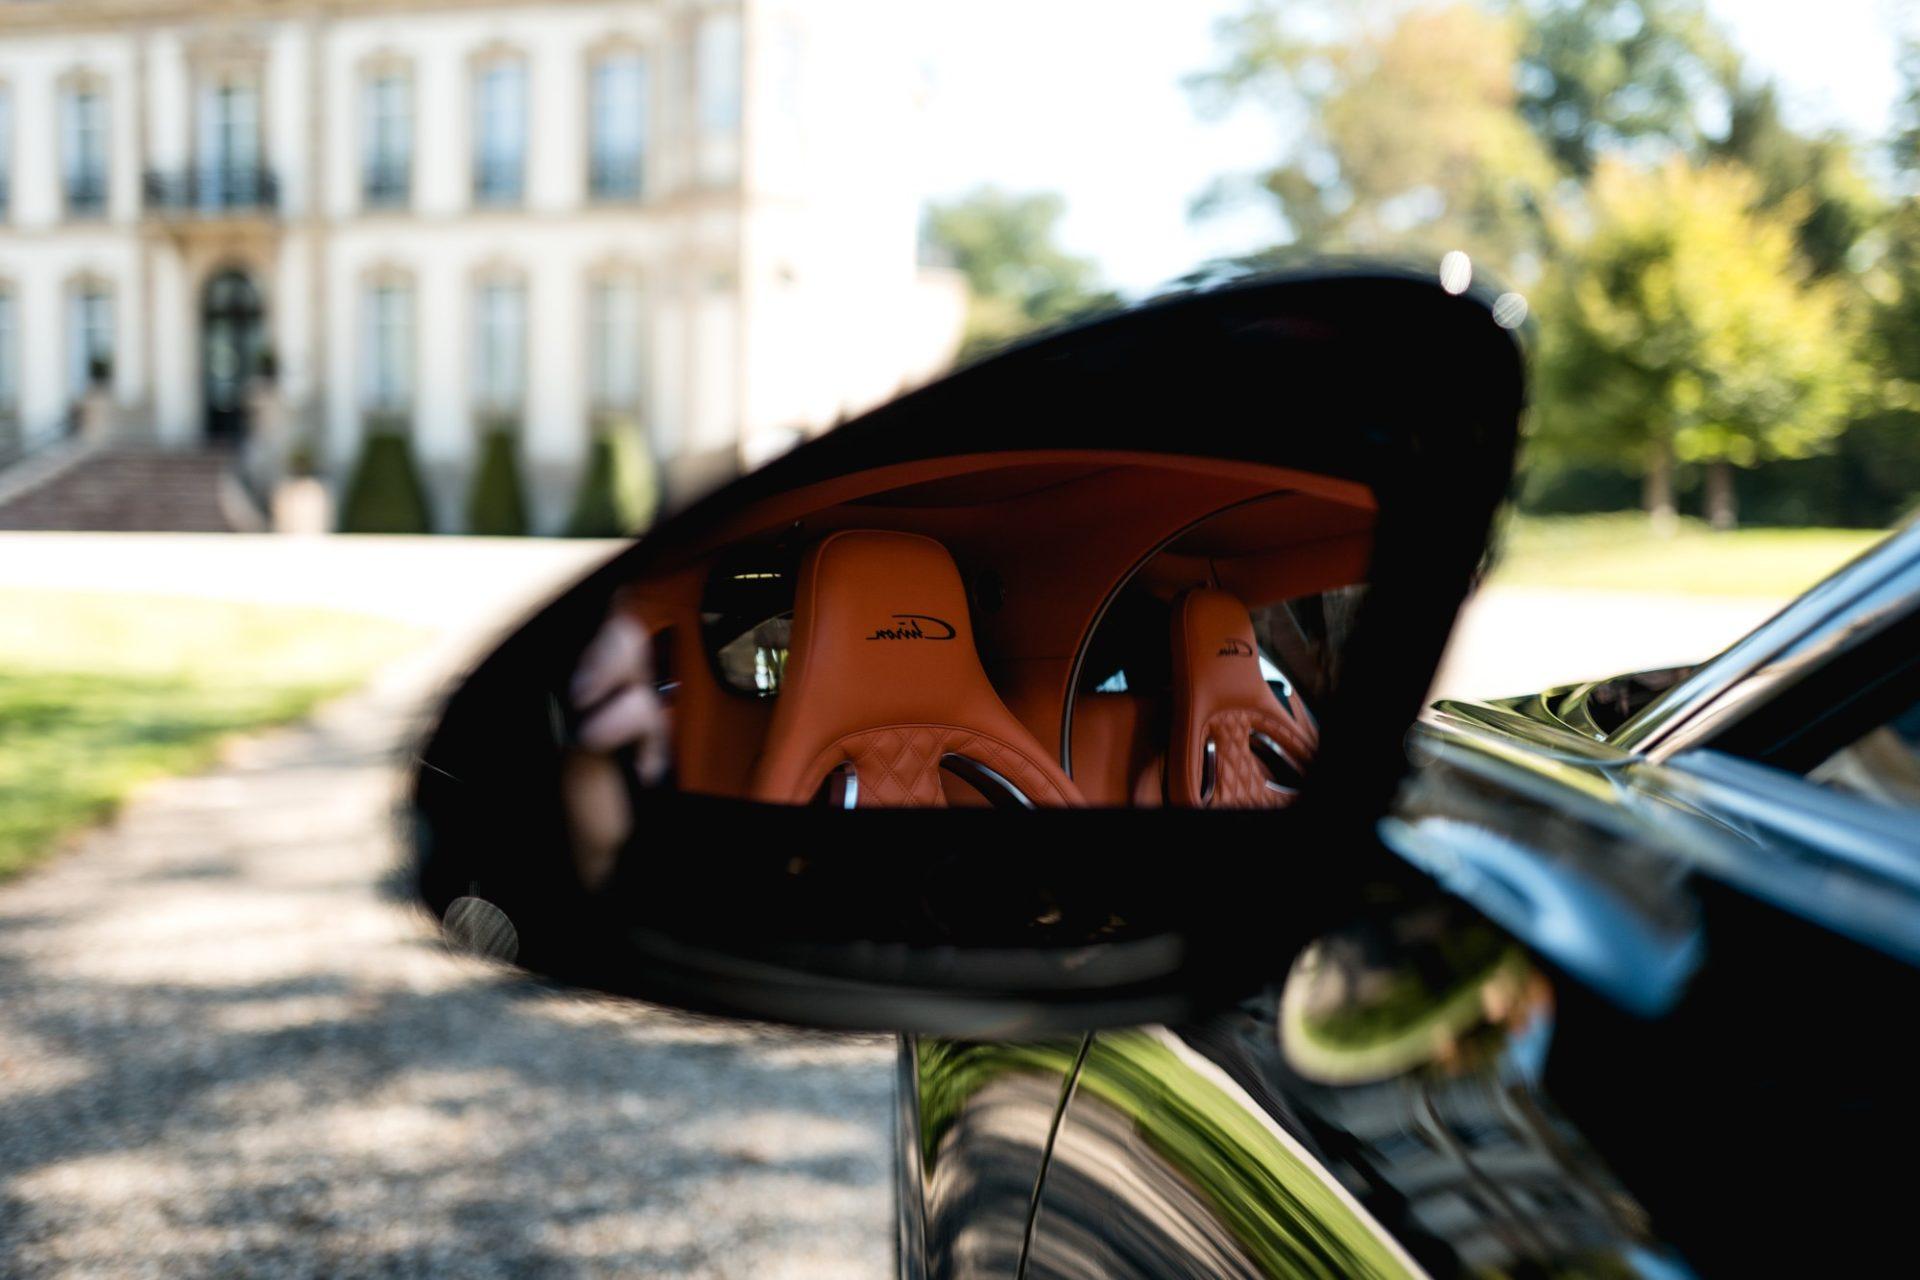 Ateliers Bugatti à Molsheim - Bugatti Chiron - Rétroviseur